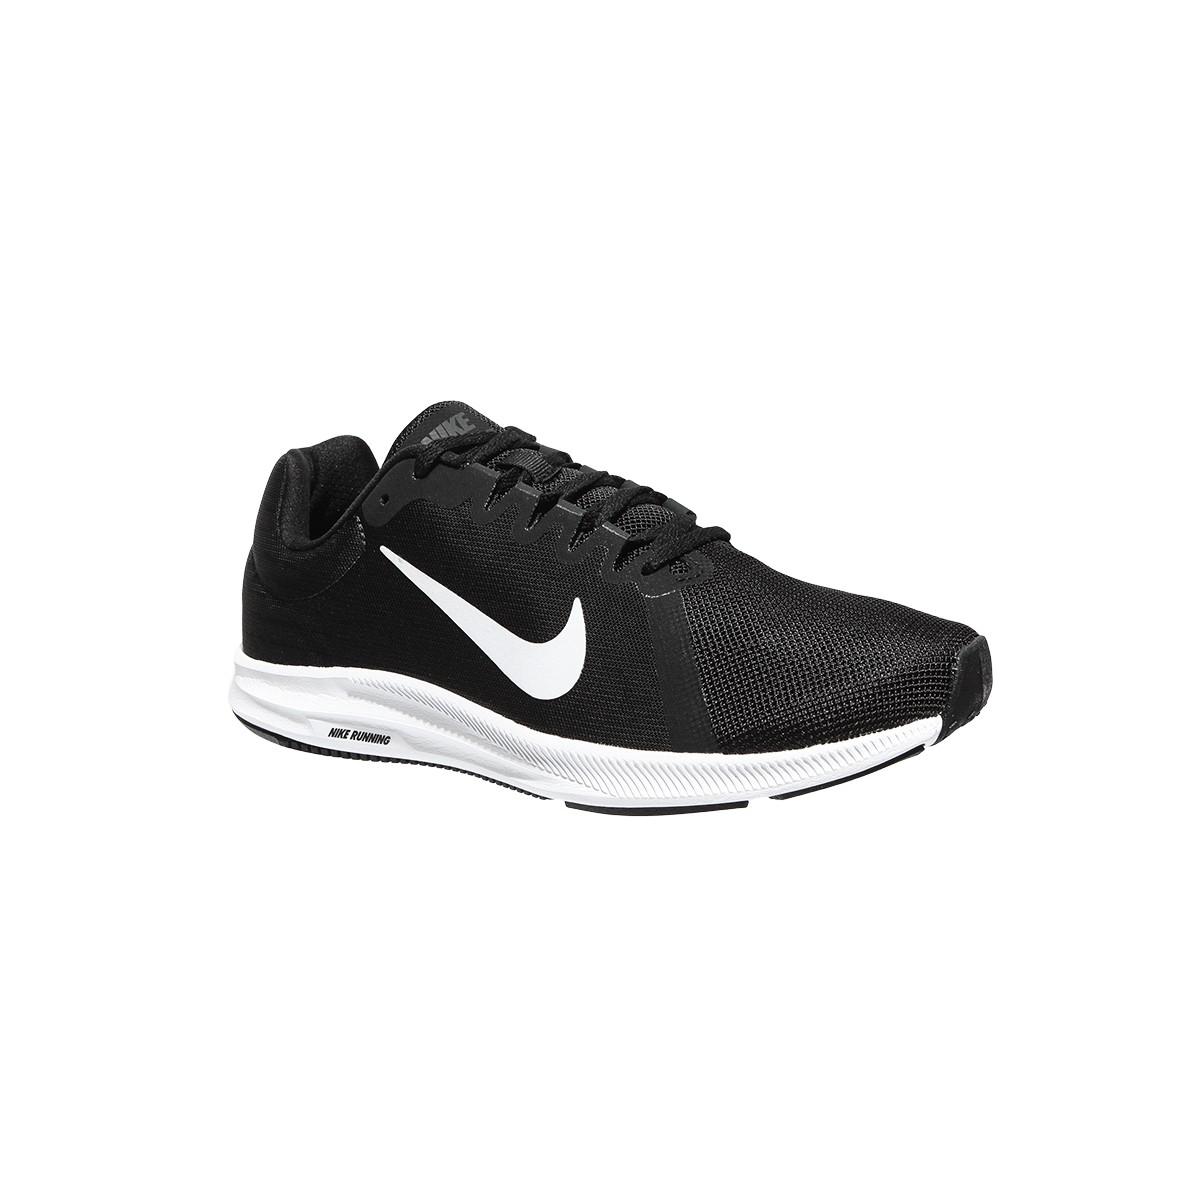 74704d6050d06 ... Nike Downshifter 8 Zapatillas Hombre Running 908984 001 Negras ...